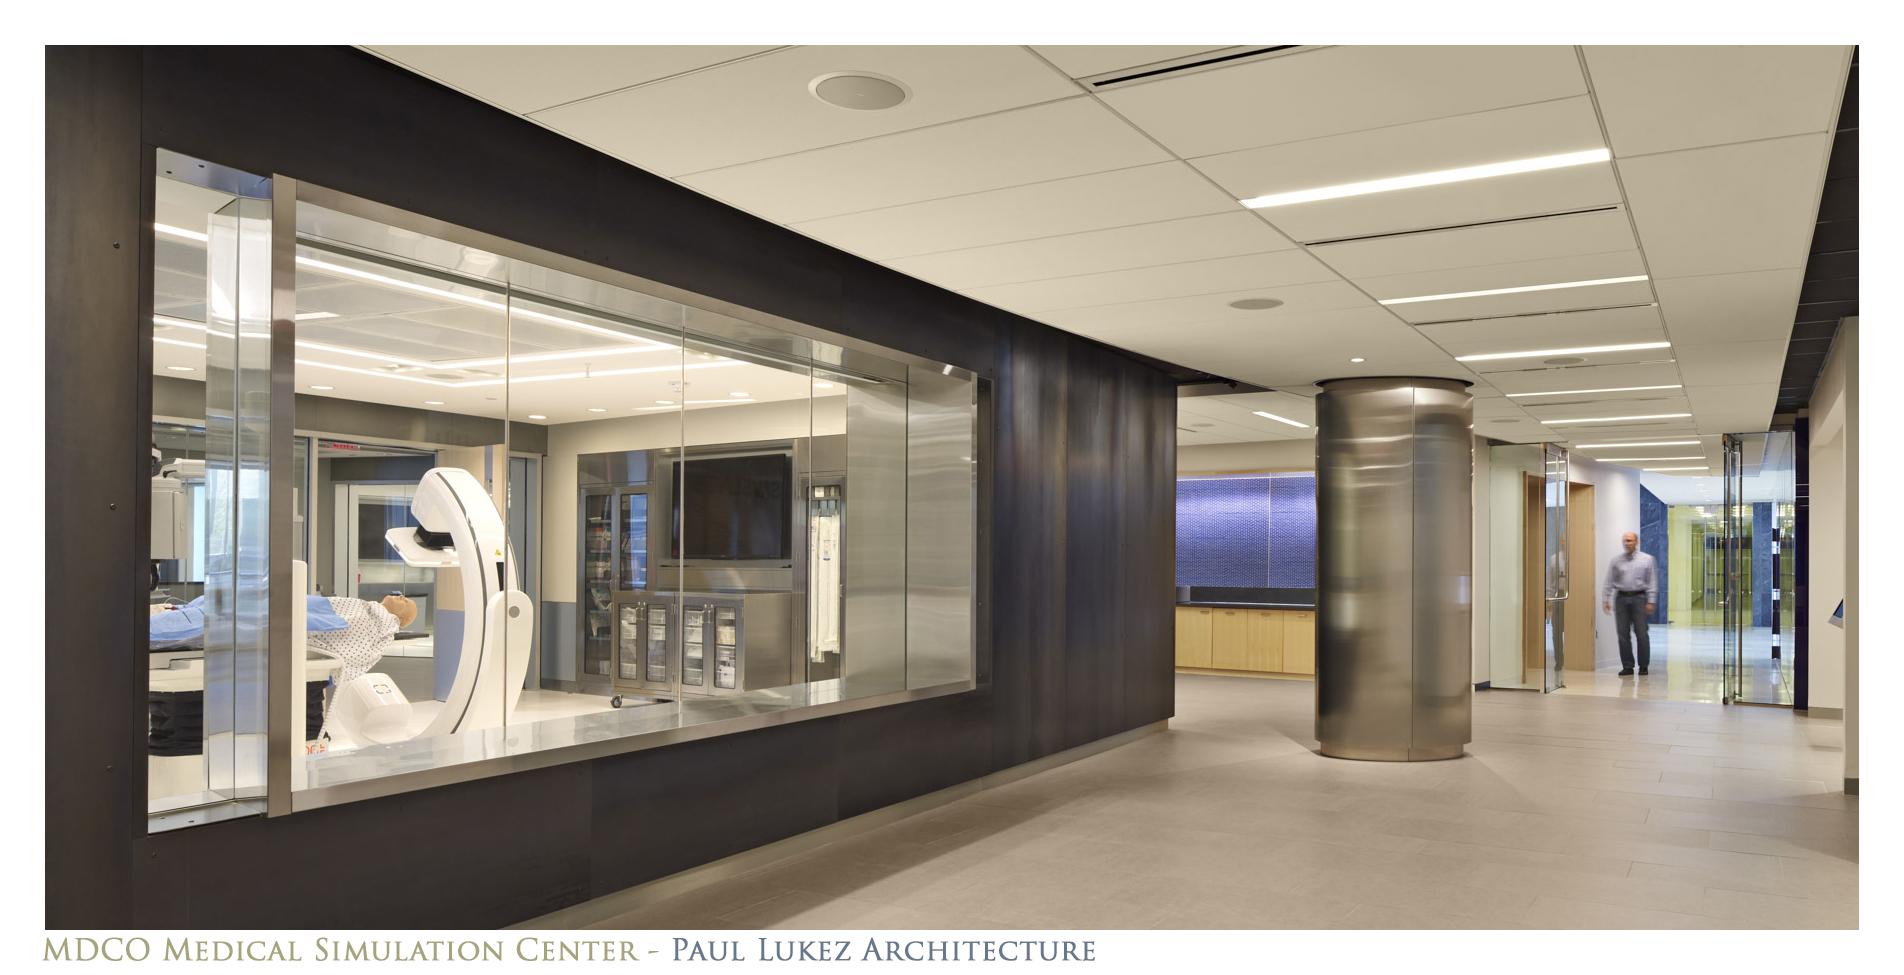 022_Robert-Benson-Photography-Lukez-Architecture-Medco-MDCO-Medical-Simulation-Center-07.jpg